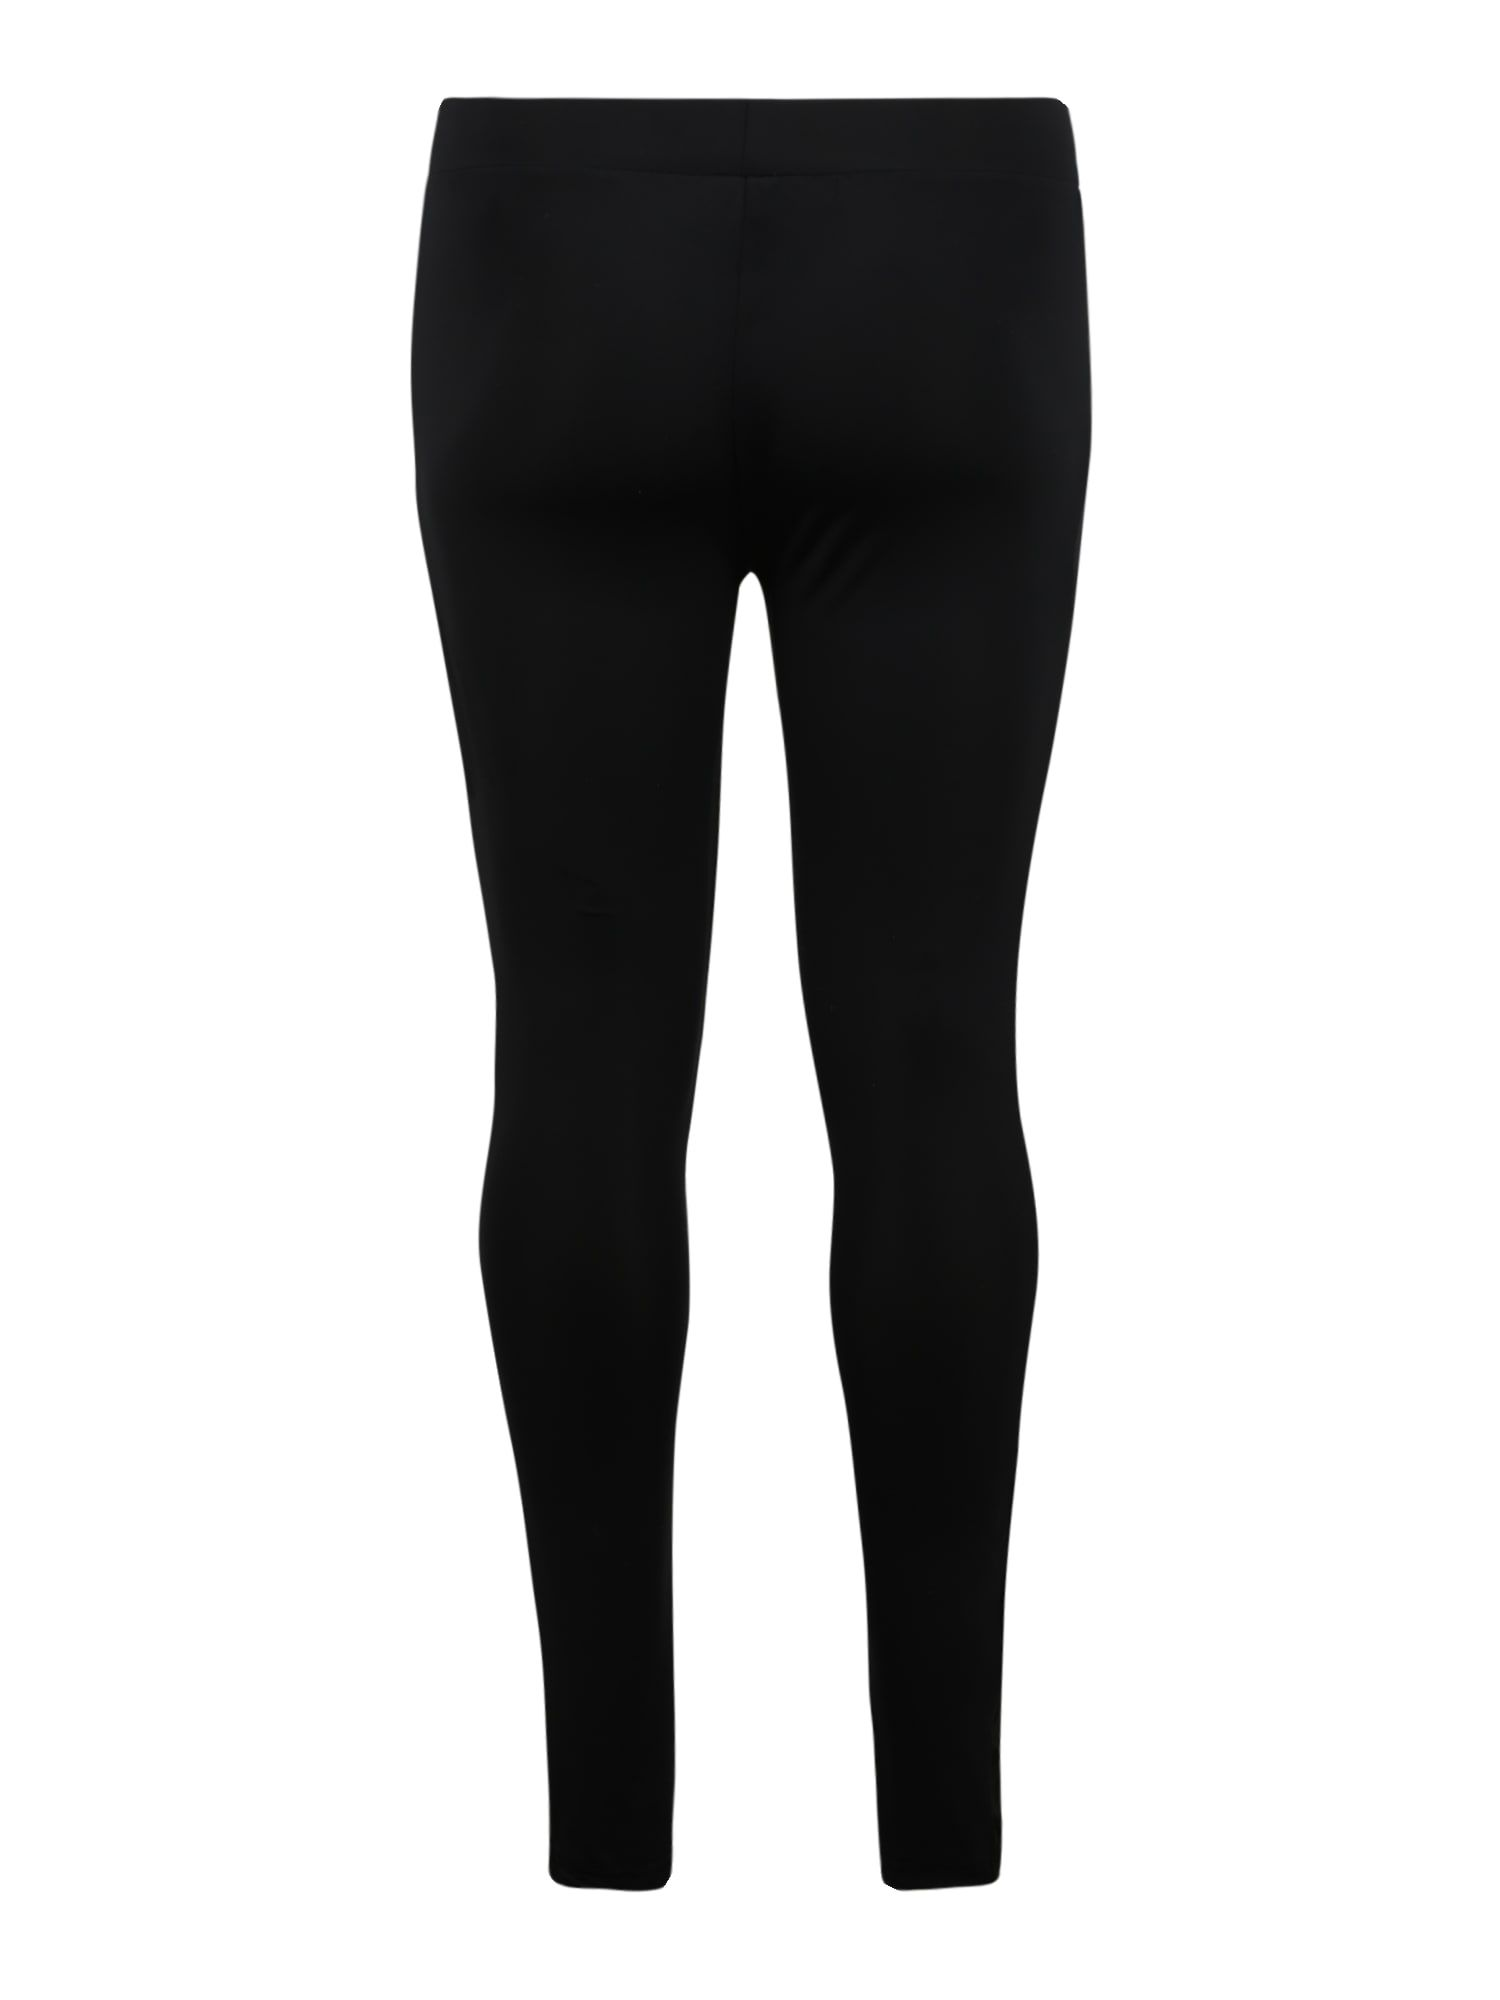 Urban Classics Curvy Hose 'Ladies Jacquard Camo Striped Leggings' Damen, Schwarz, Größe XXL #stripedleggings